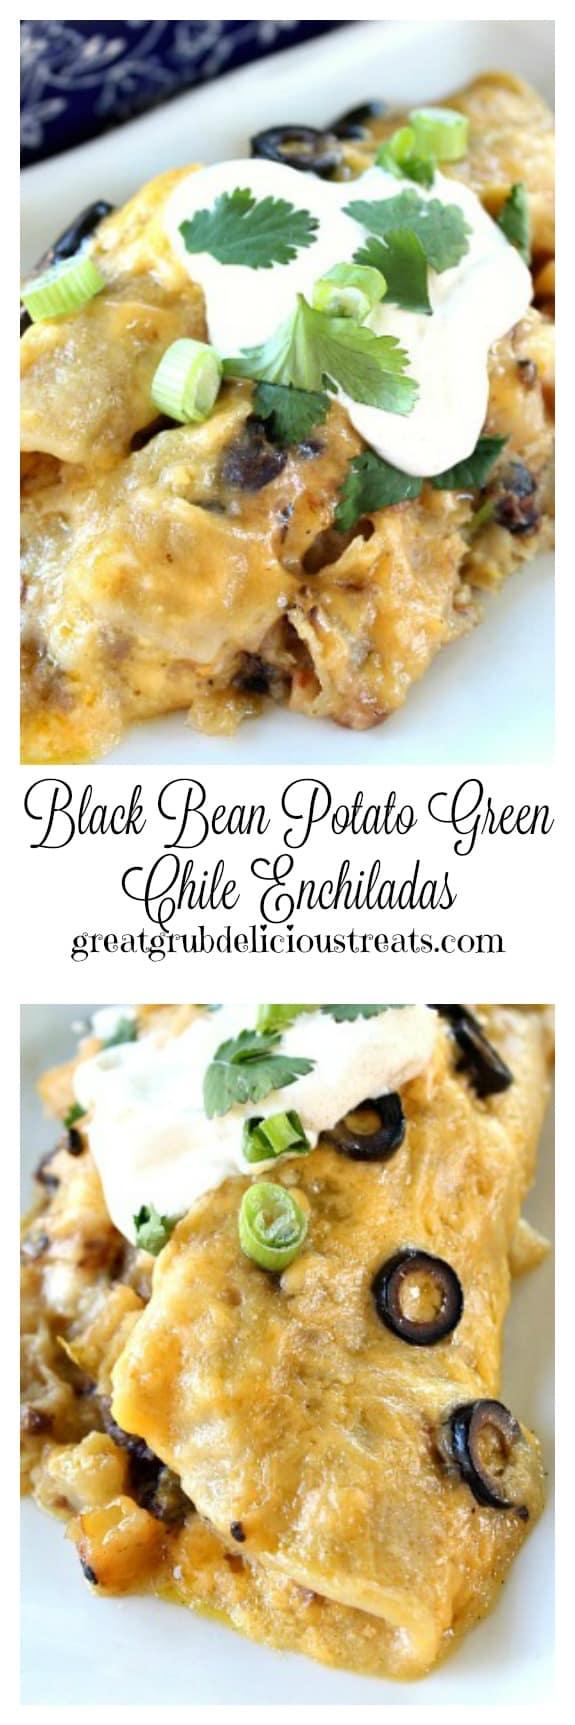 Black Bean Potato Green Chile Enchiladas